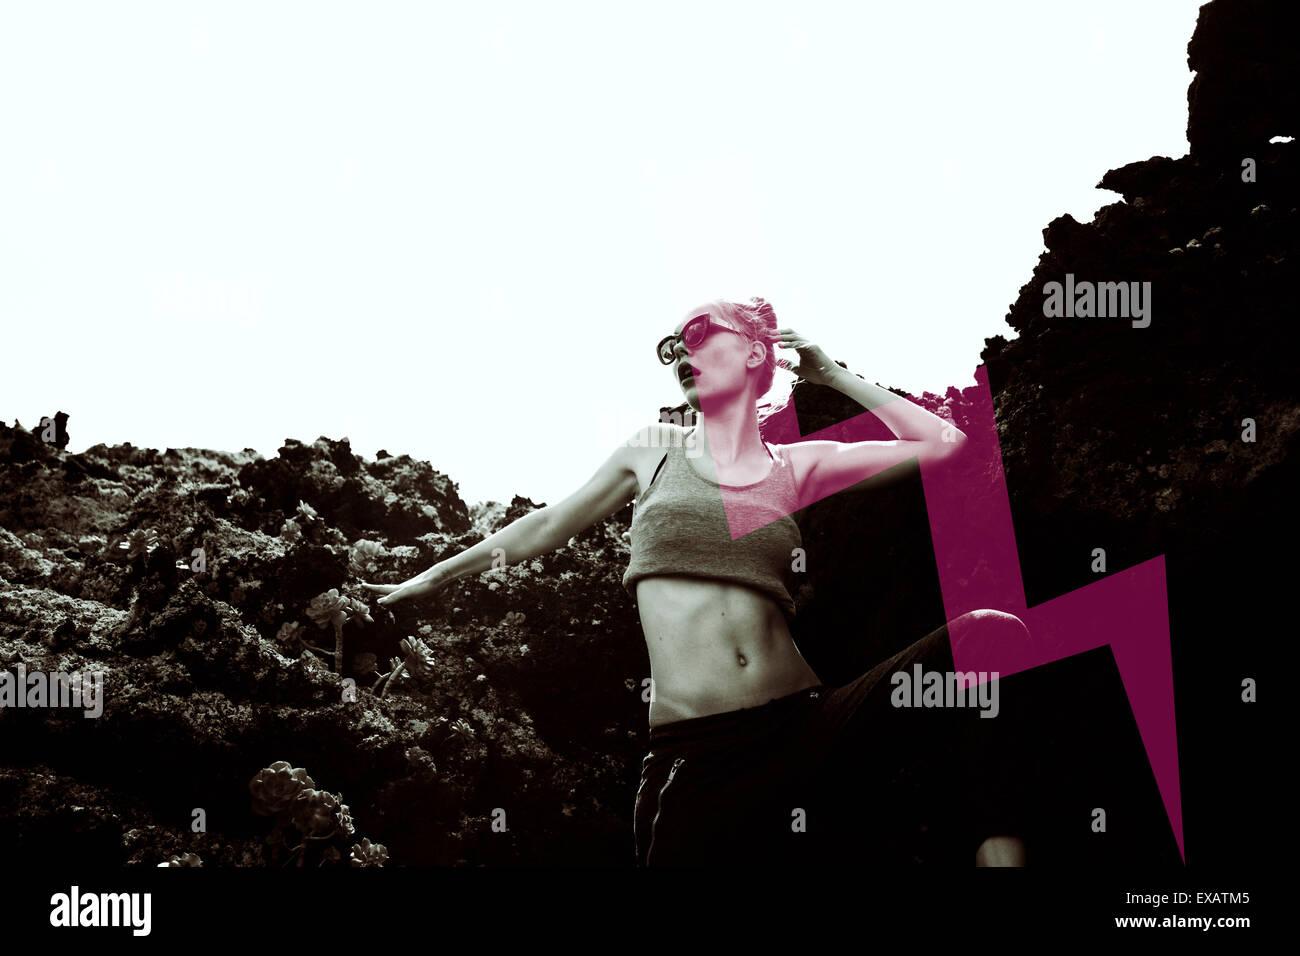 Jeune femme, mode posent dans le volcano rock Photo Stock